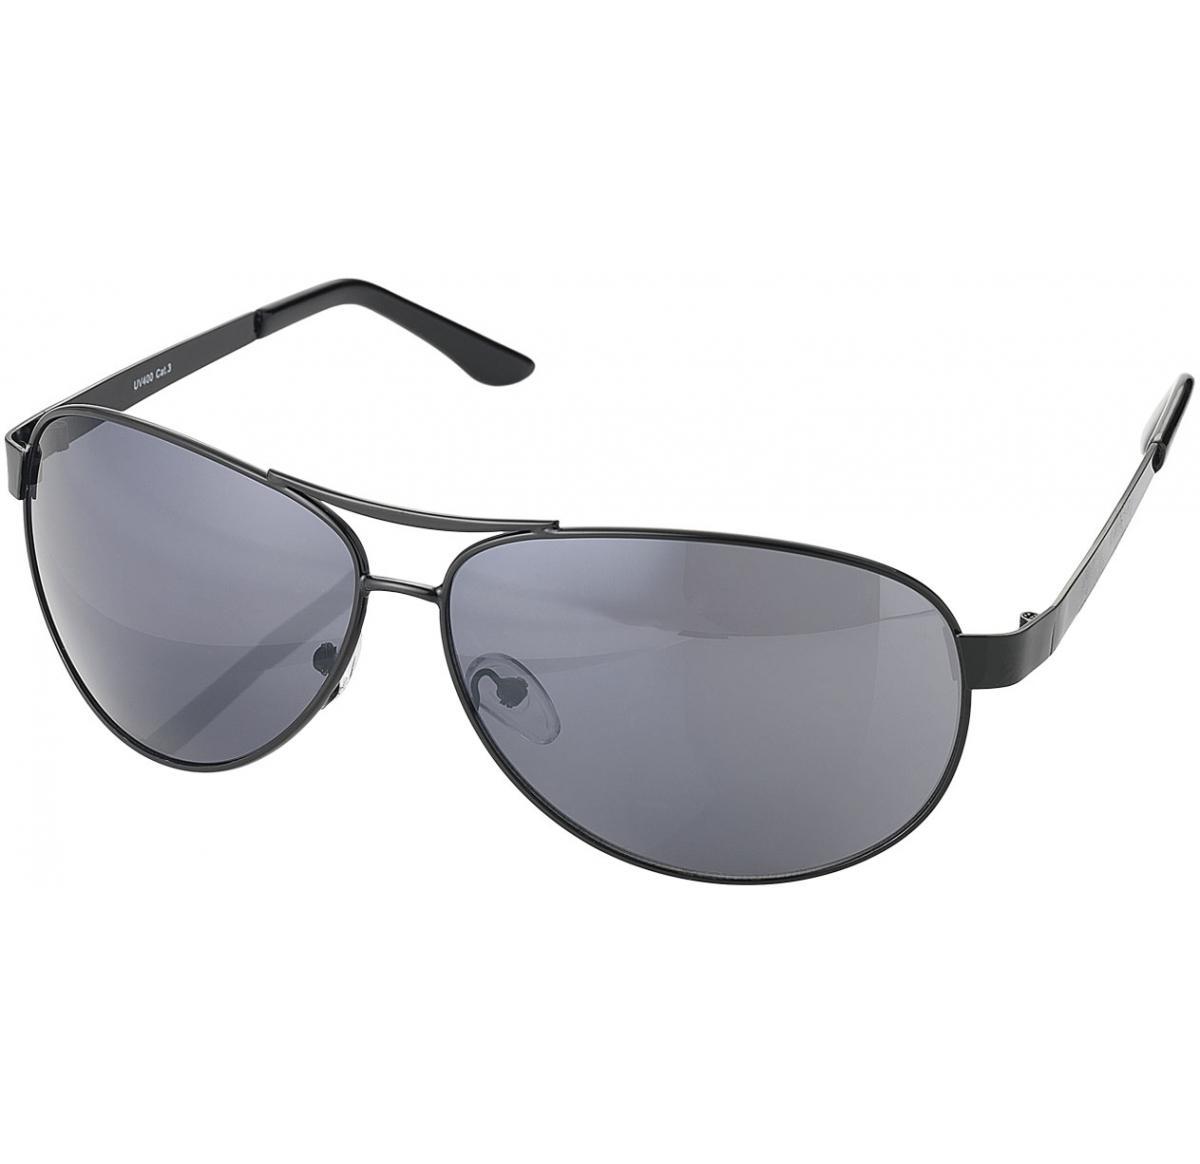 90c8fa1cb74 Trendy Maverick Promotional Sunglasses - Buy Promotional Products UK ...